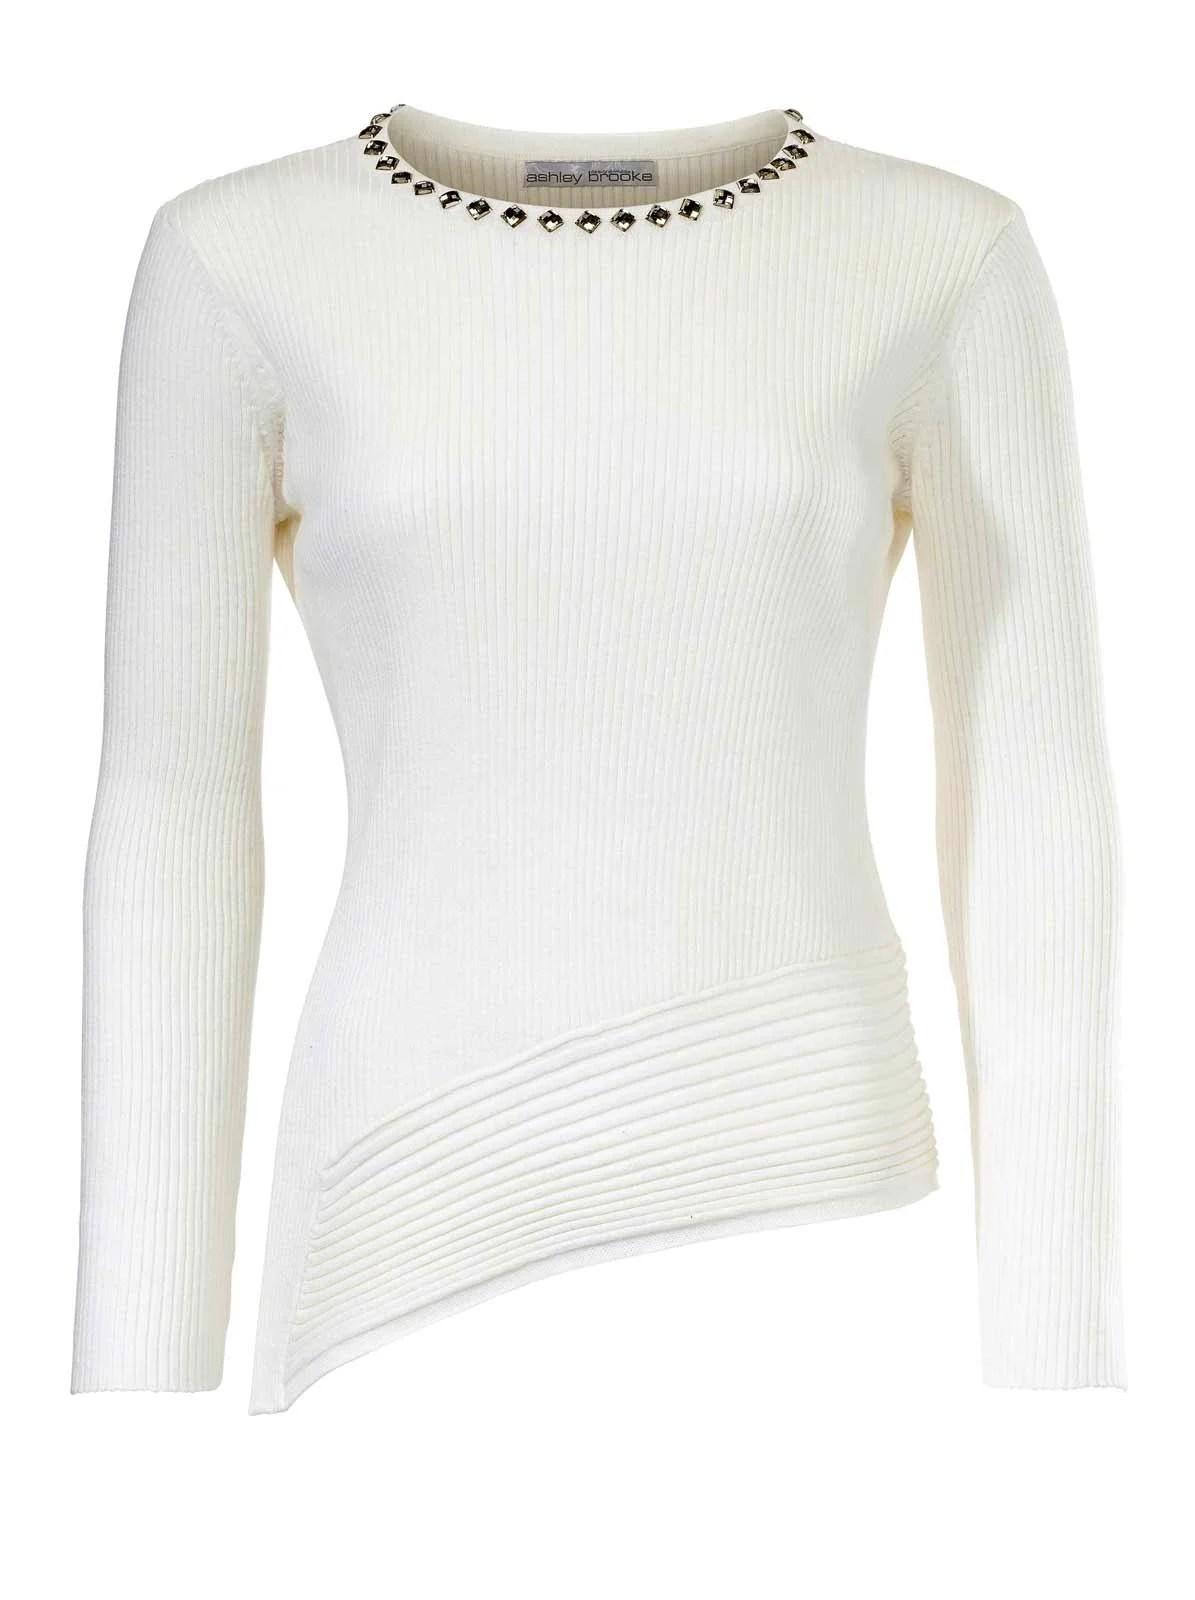 036.765 ASHLEY BROOKE Damen Designer-Pullover m. Strass Offwhite